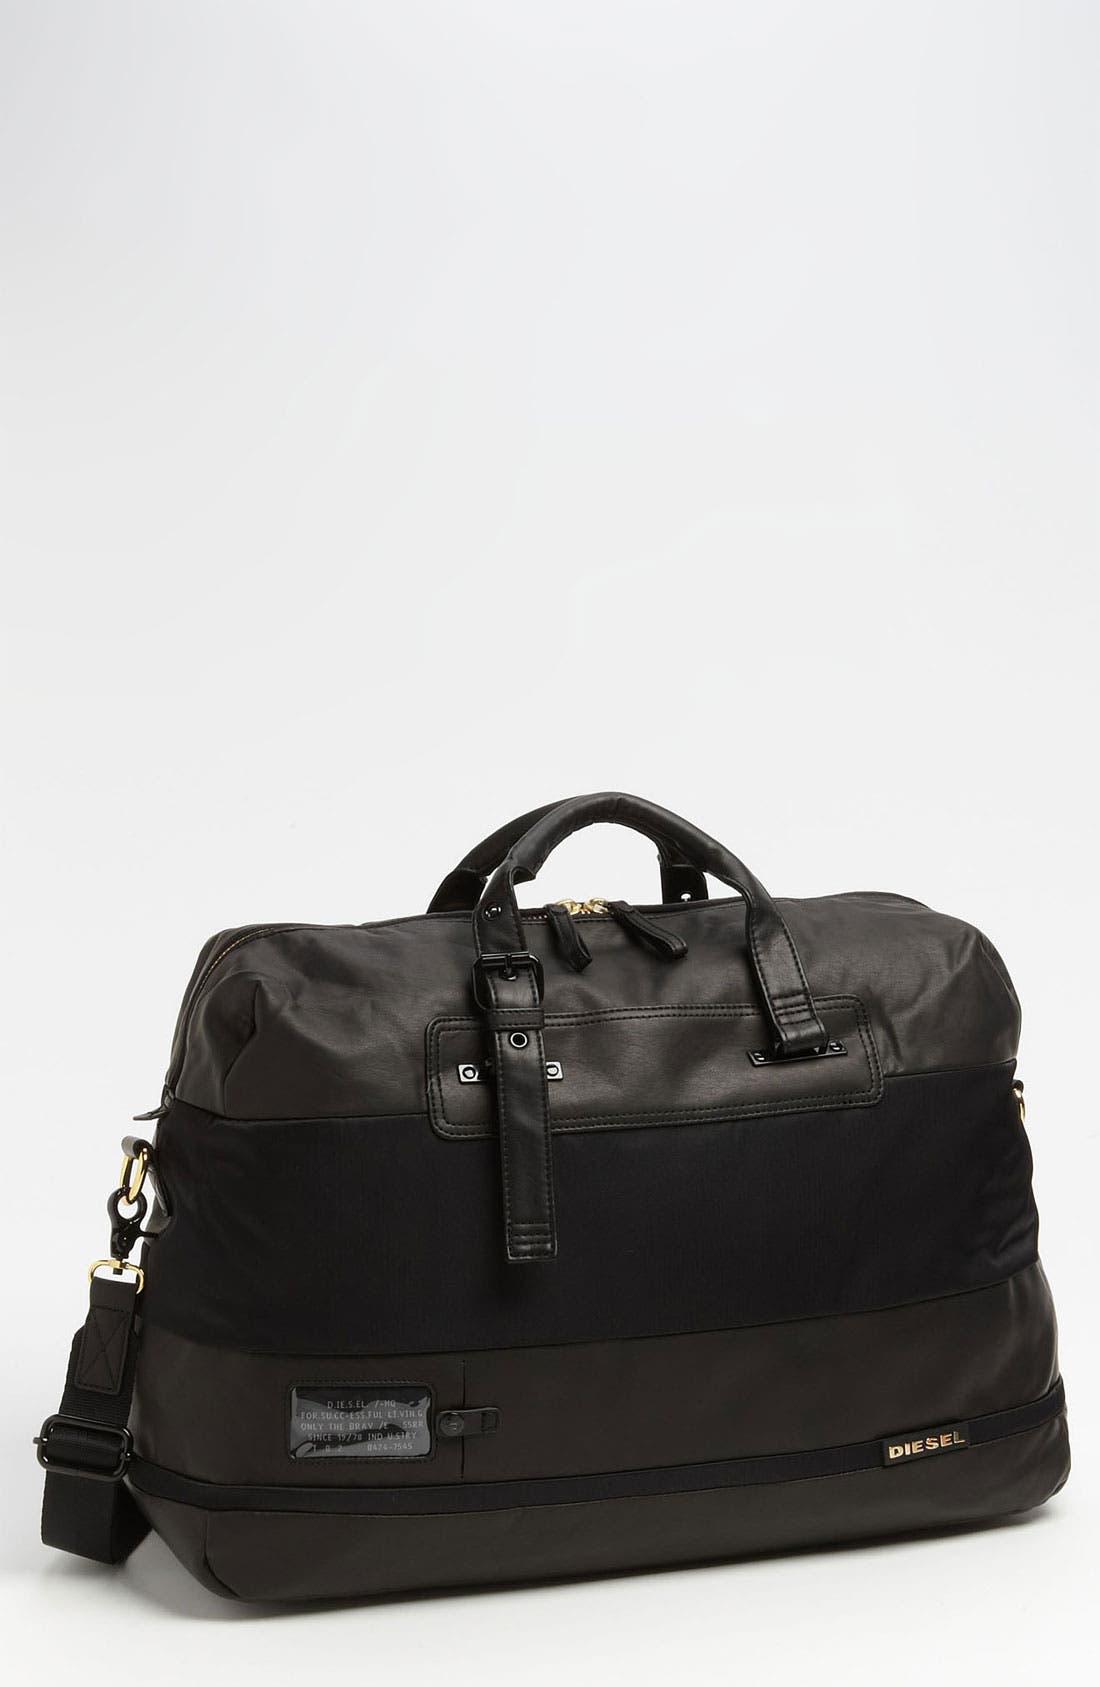 Alternate Image 1 Selected - DIESEL® 'Urban Reporters - Corsair' Overnight Bag